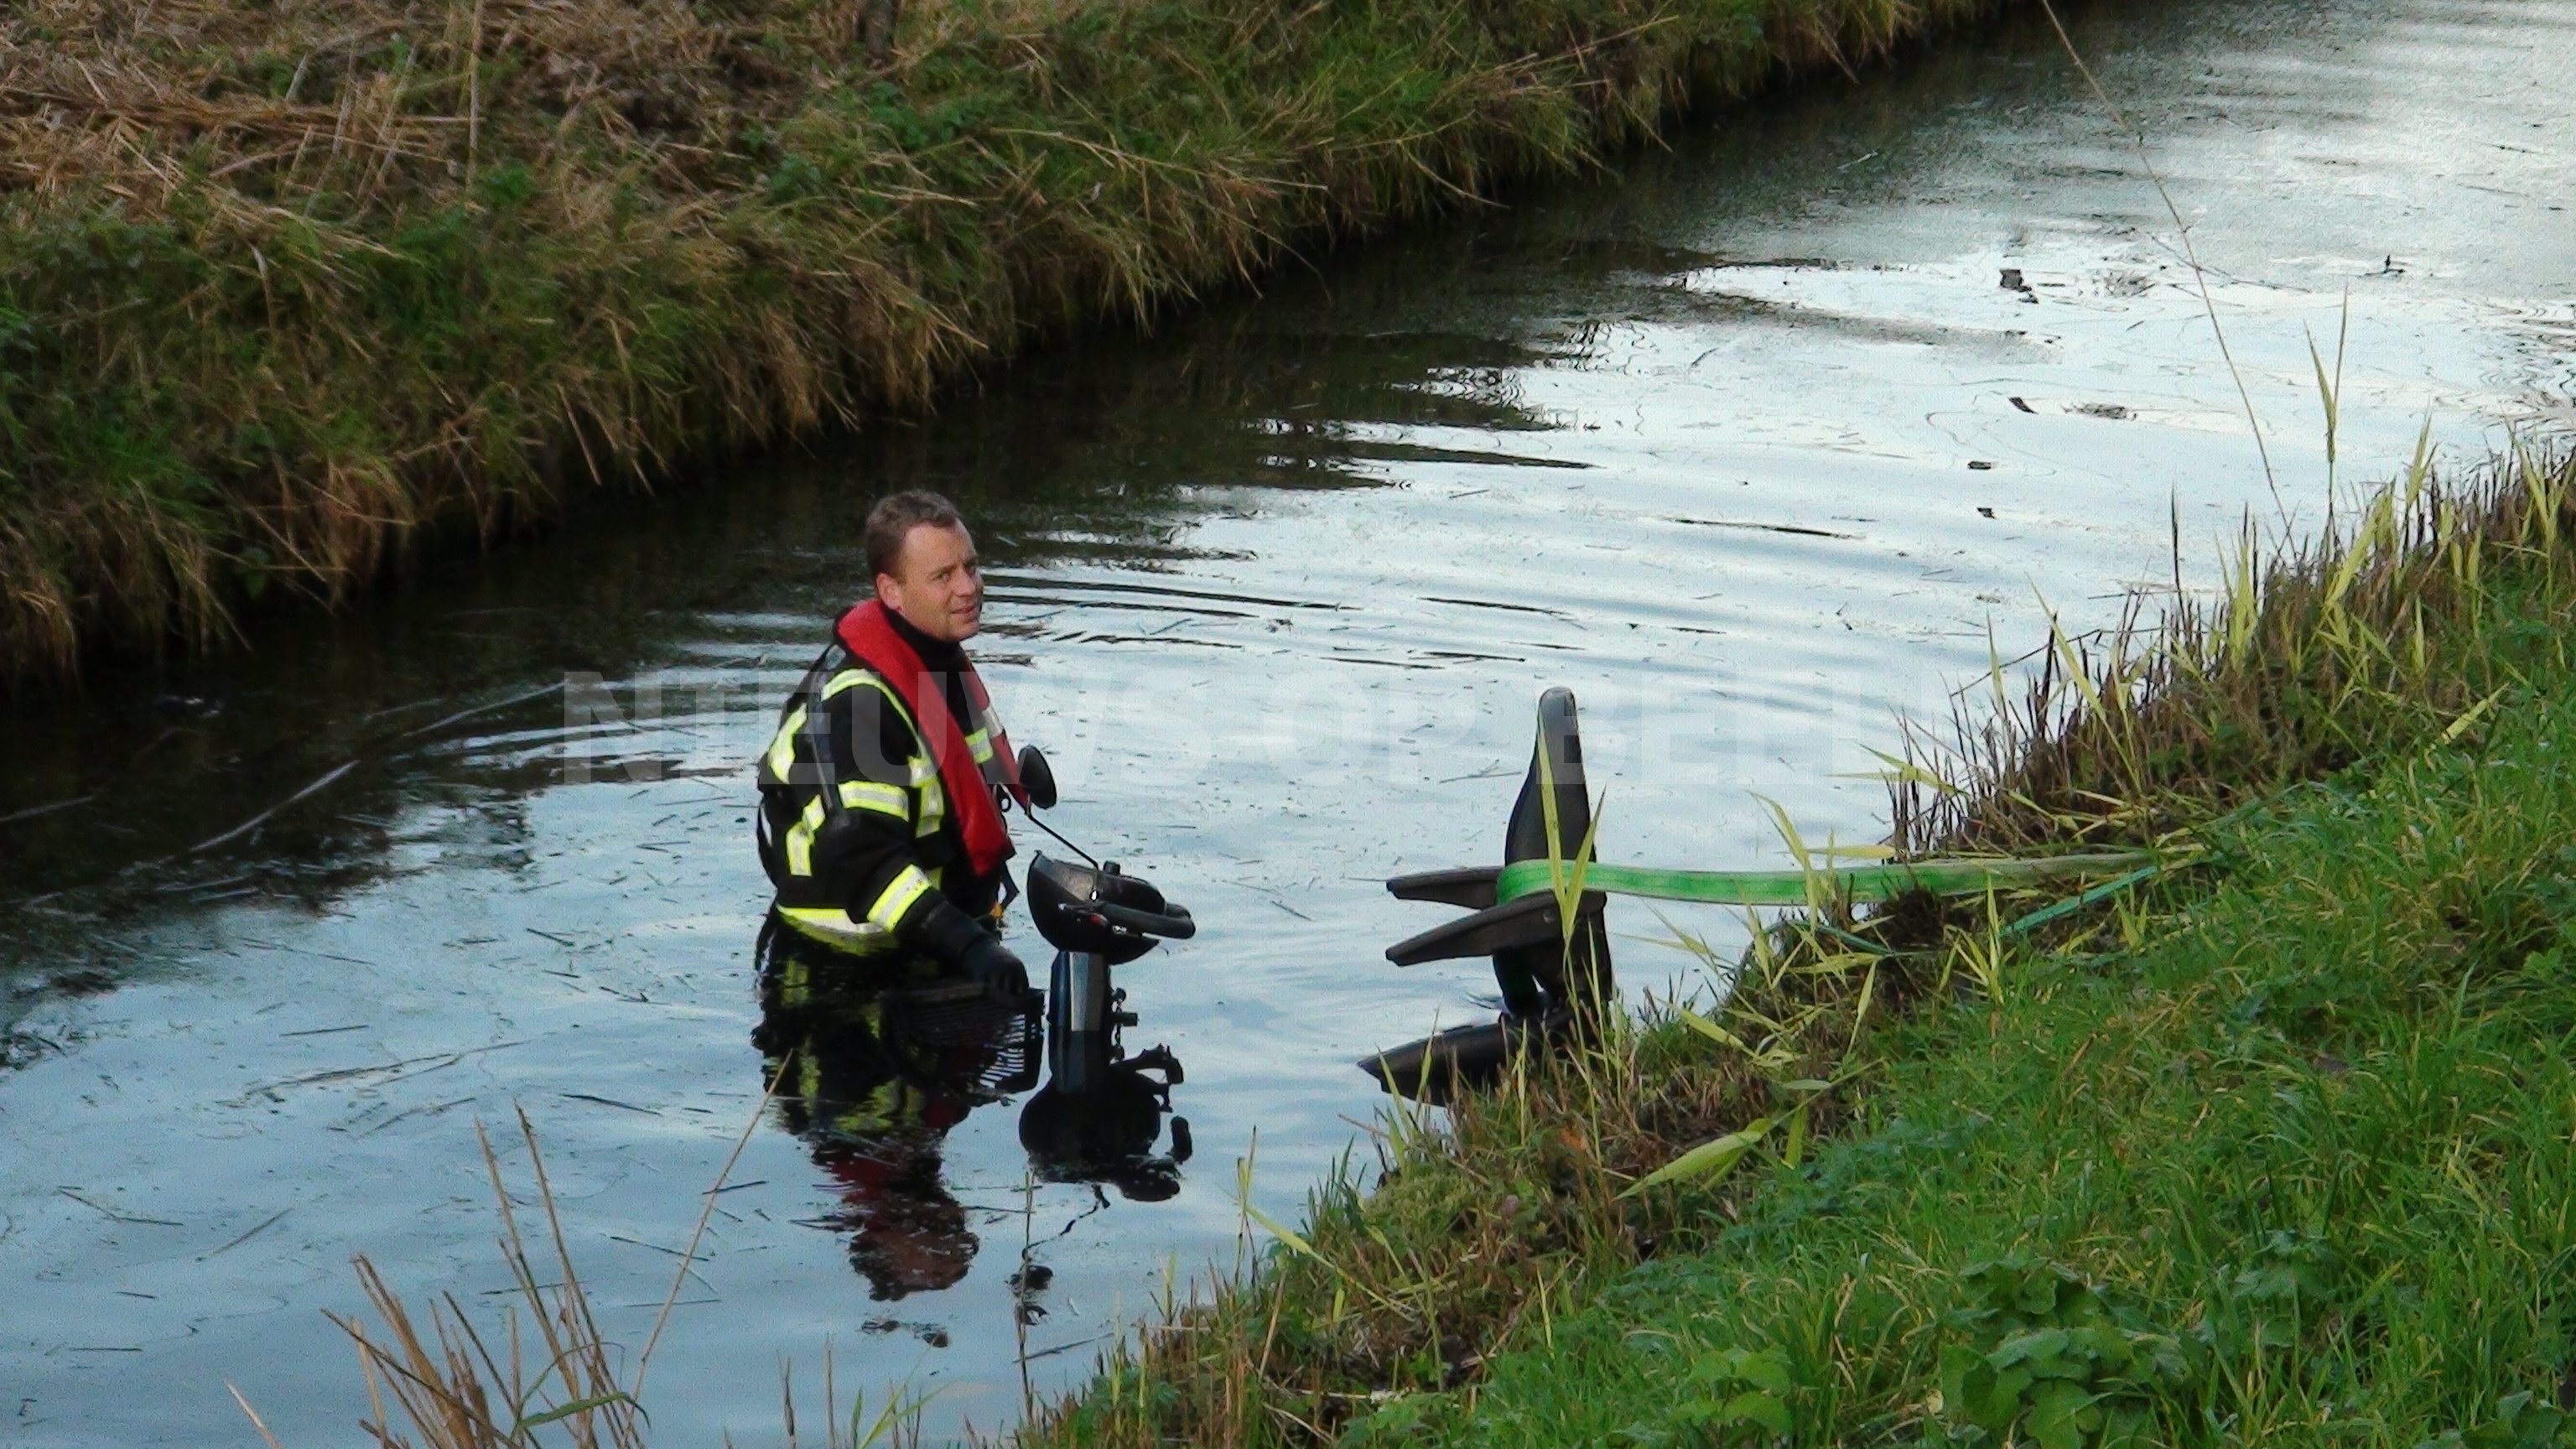 Oudere man te water op de Heuvelweg in Zoetermeer